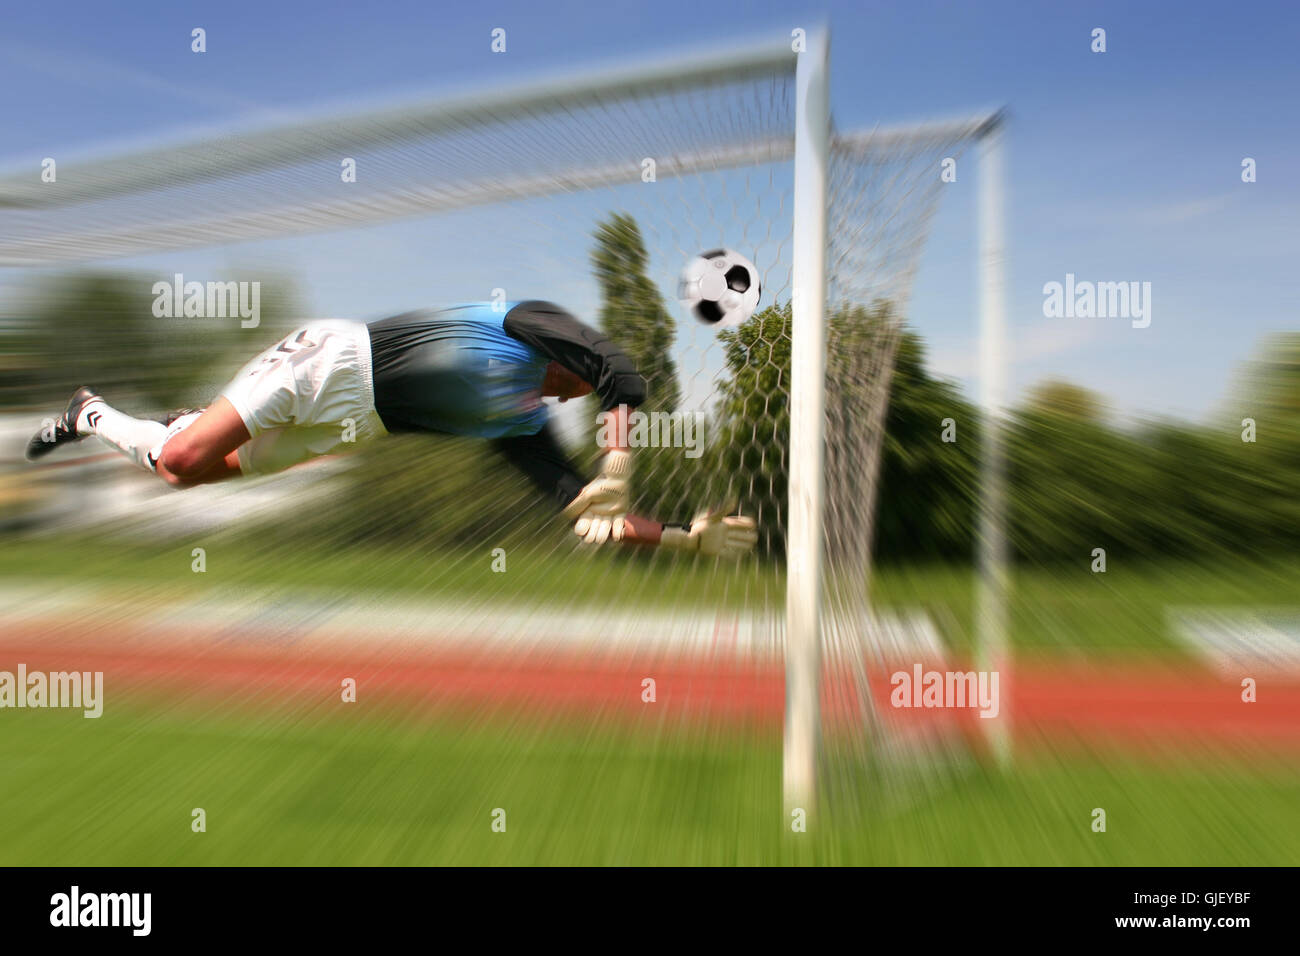 ball flight goal - Stock Image